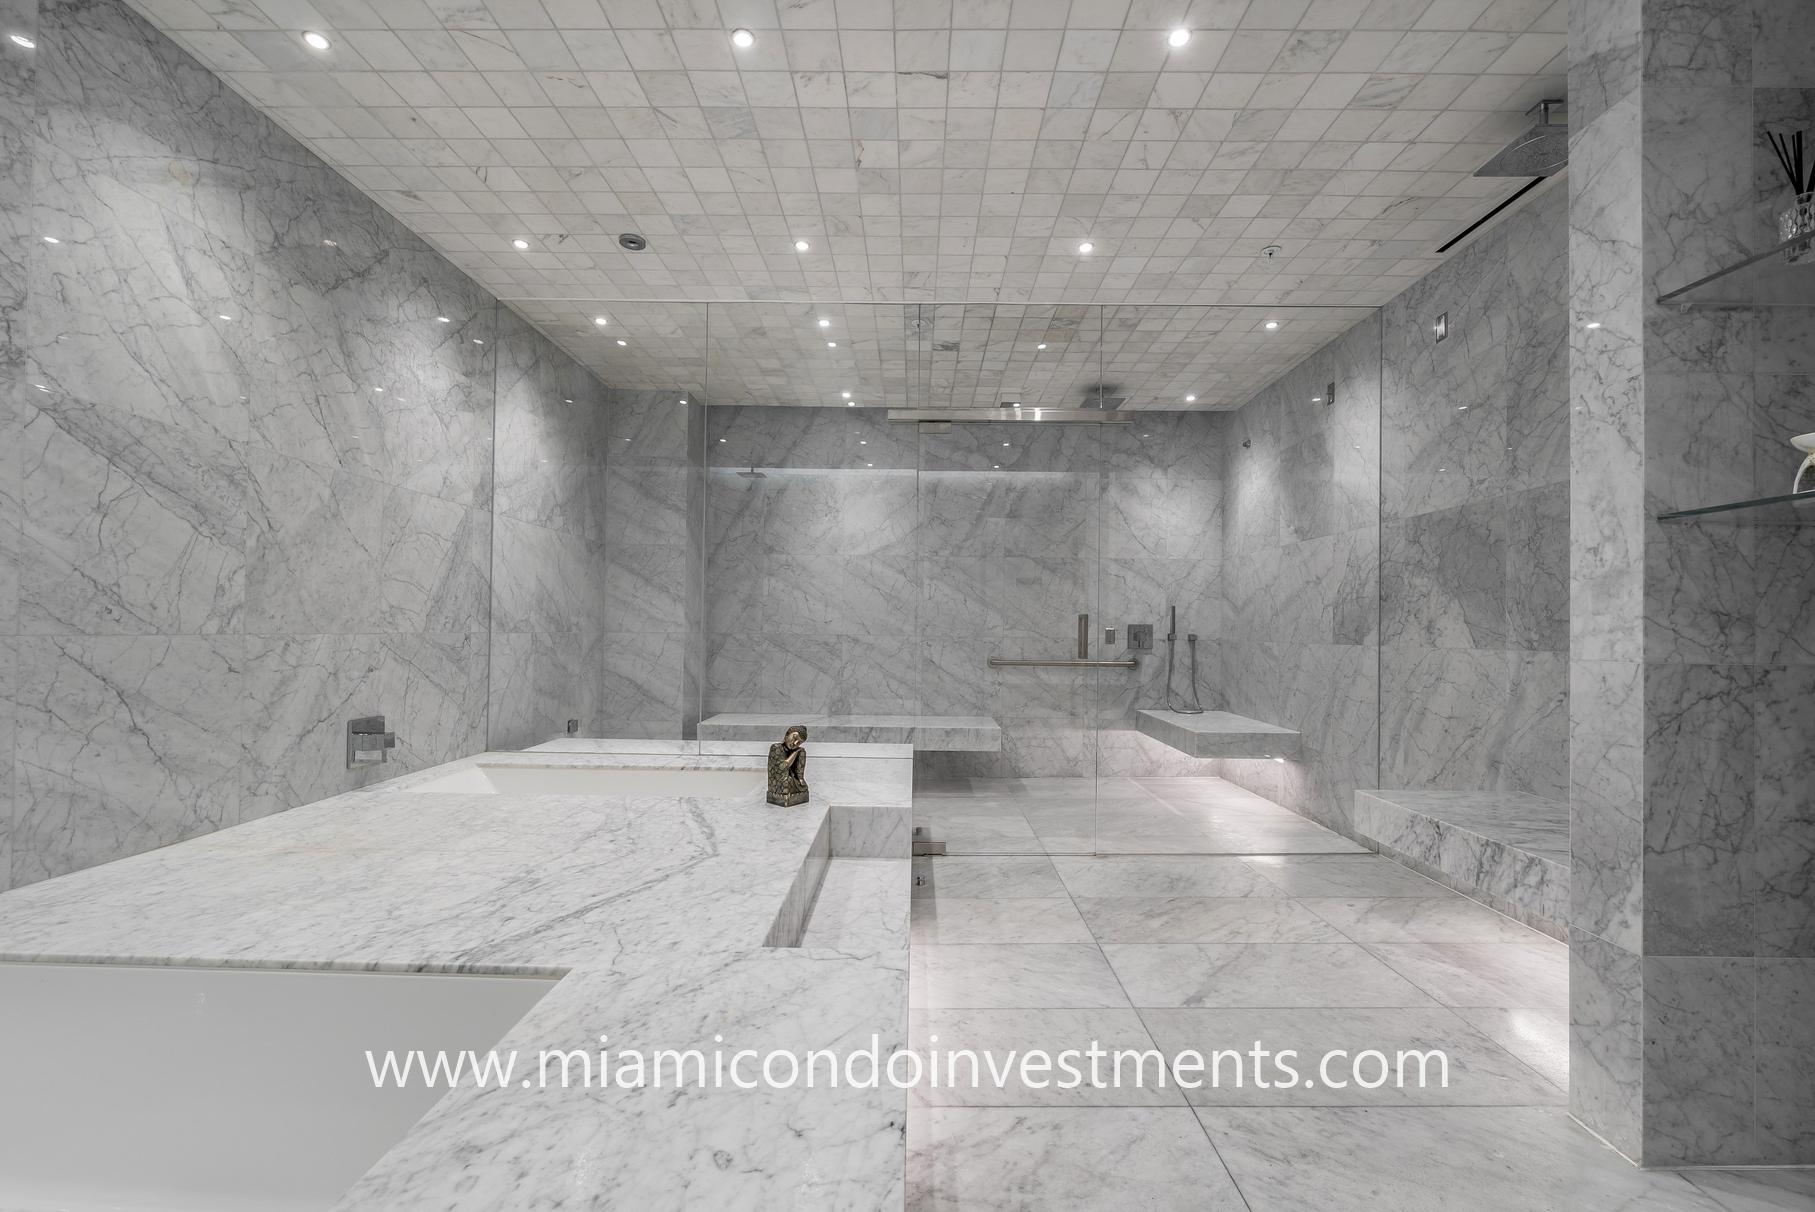 hammam spa at Rise Brickell City Centre